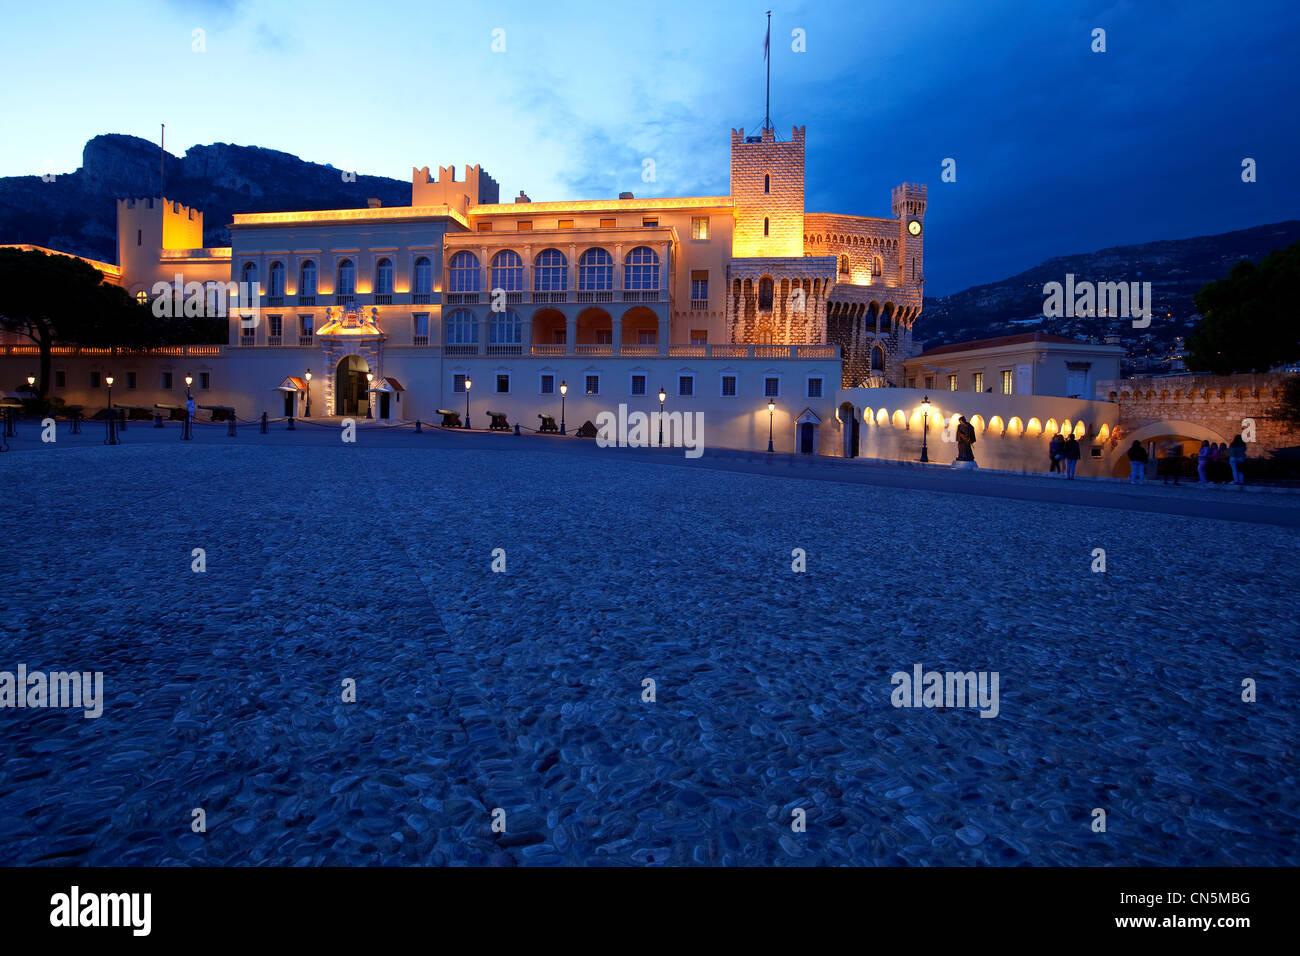 Principality of Monaco, Monaco, Place du Palais (Palace square), royal palace - Stock Image